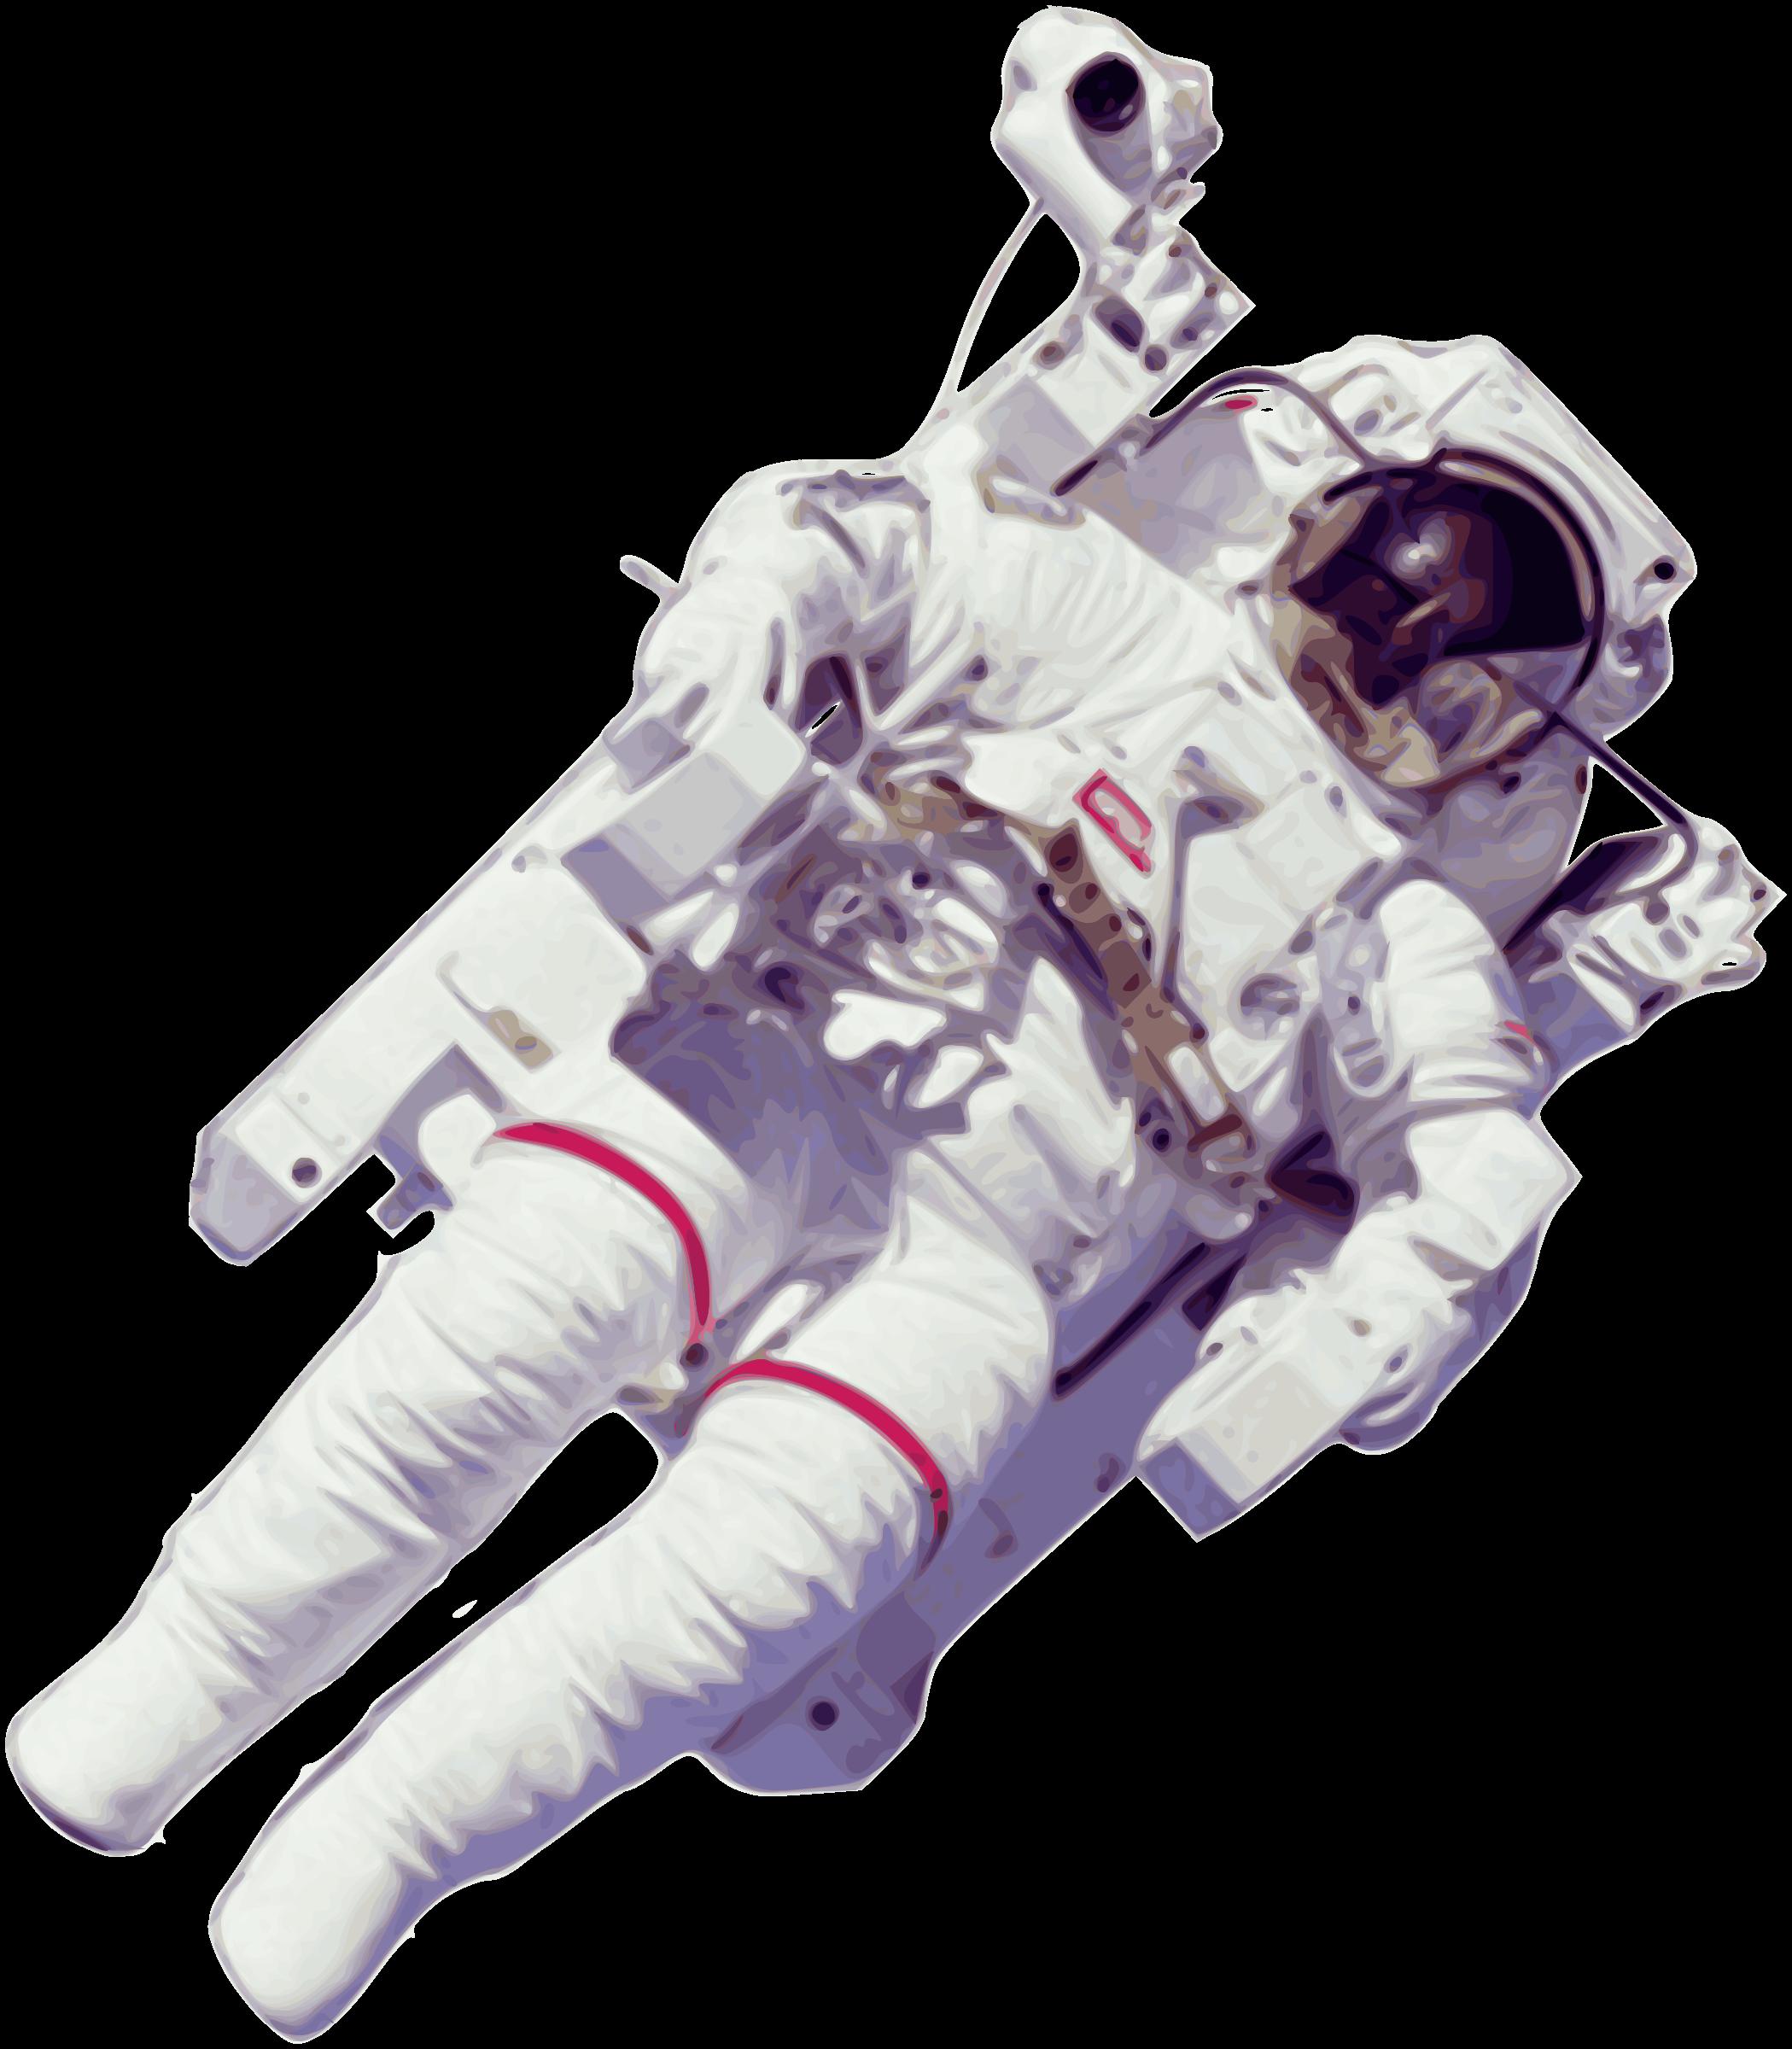 Clipart moon bitmap. Astronaut large version big